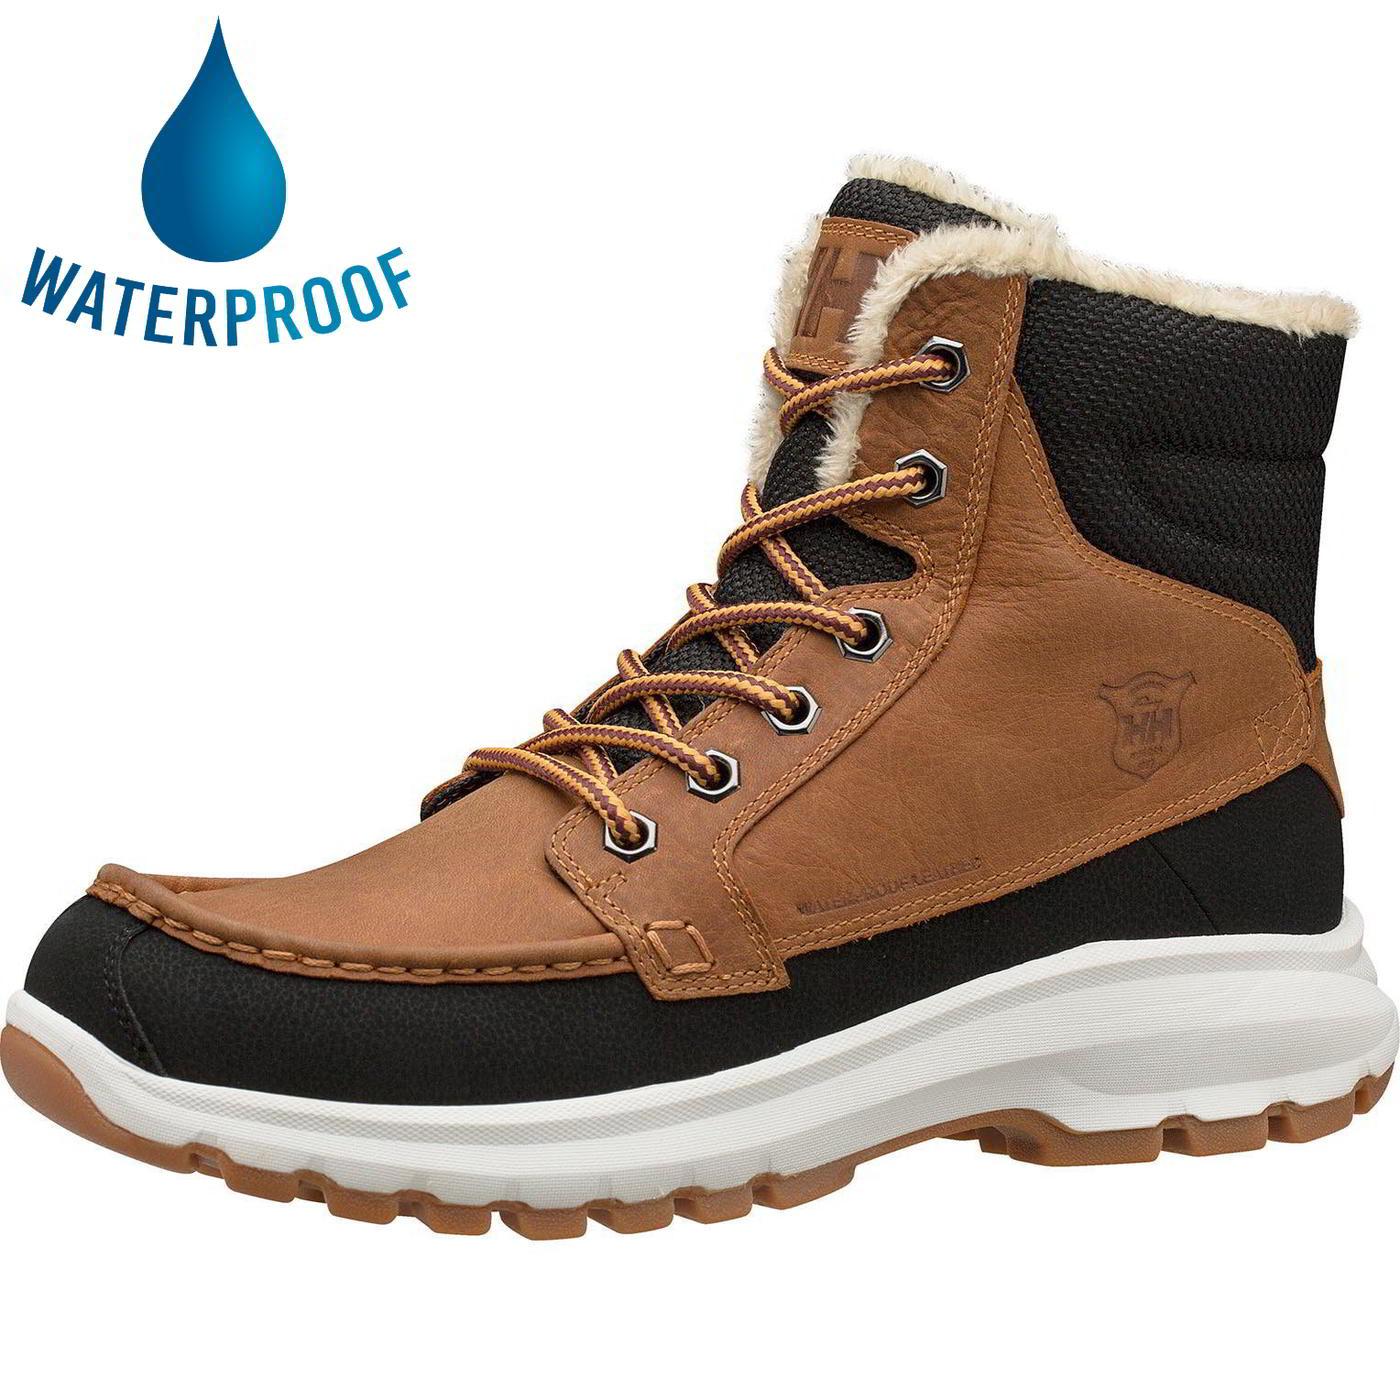 Helly Hansen Mens Garibaldi V3 Waterproof Boots - New Wheat Black Gum